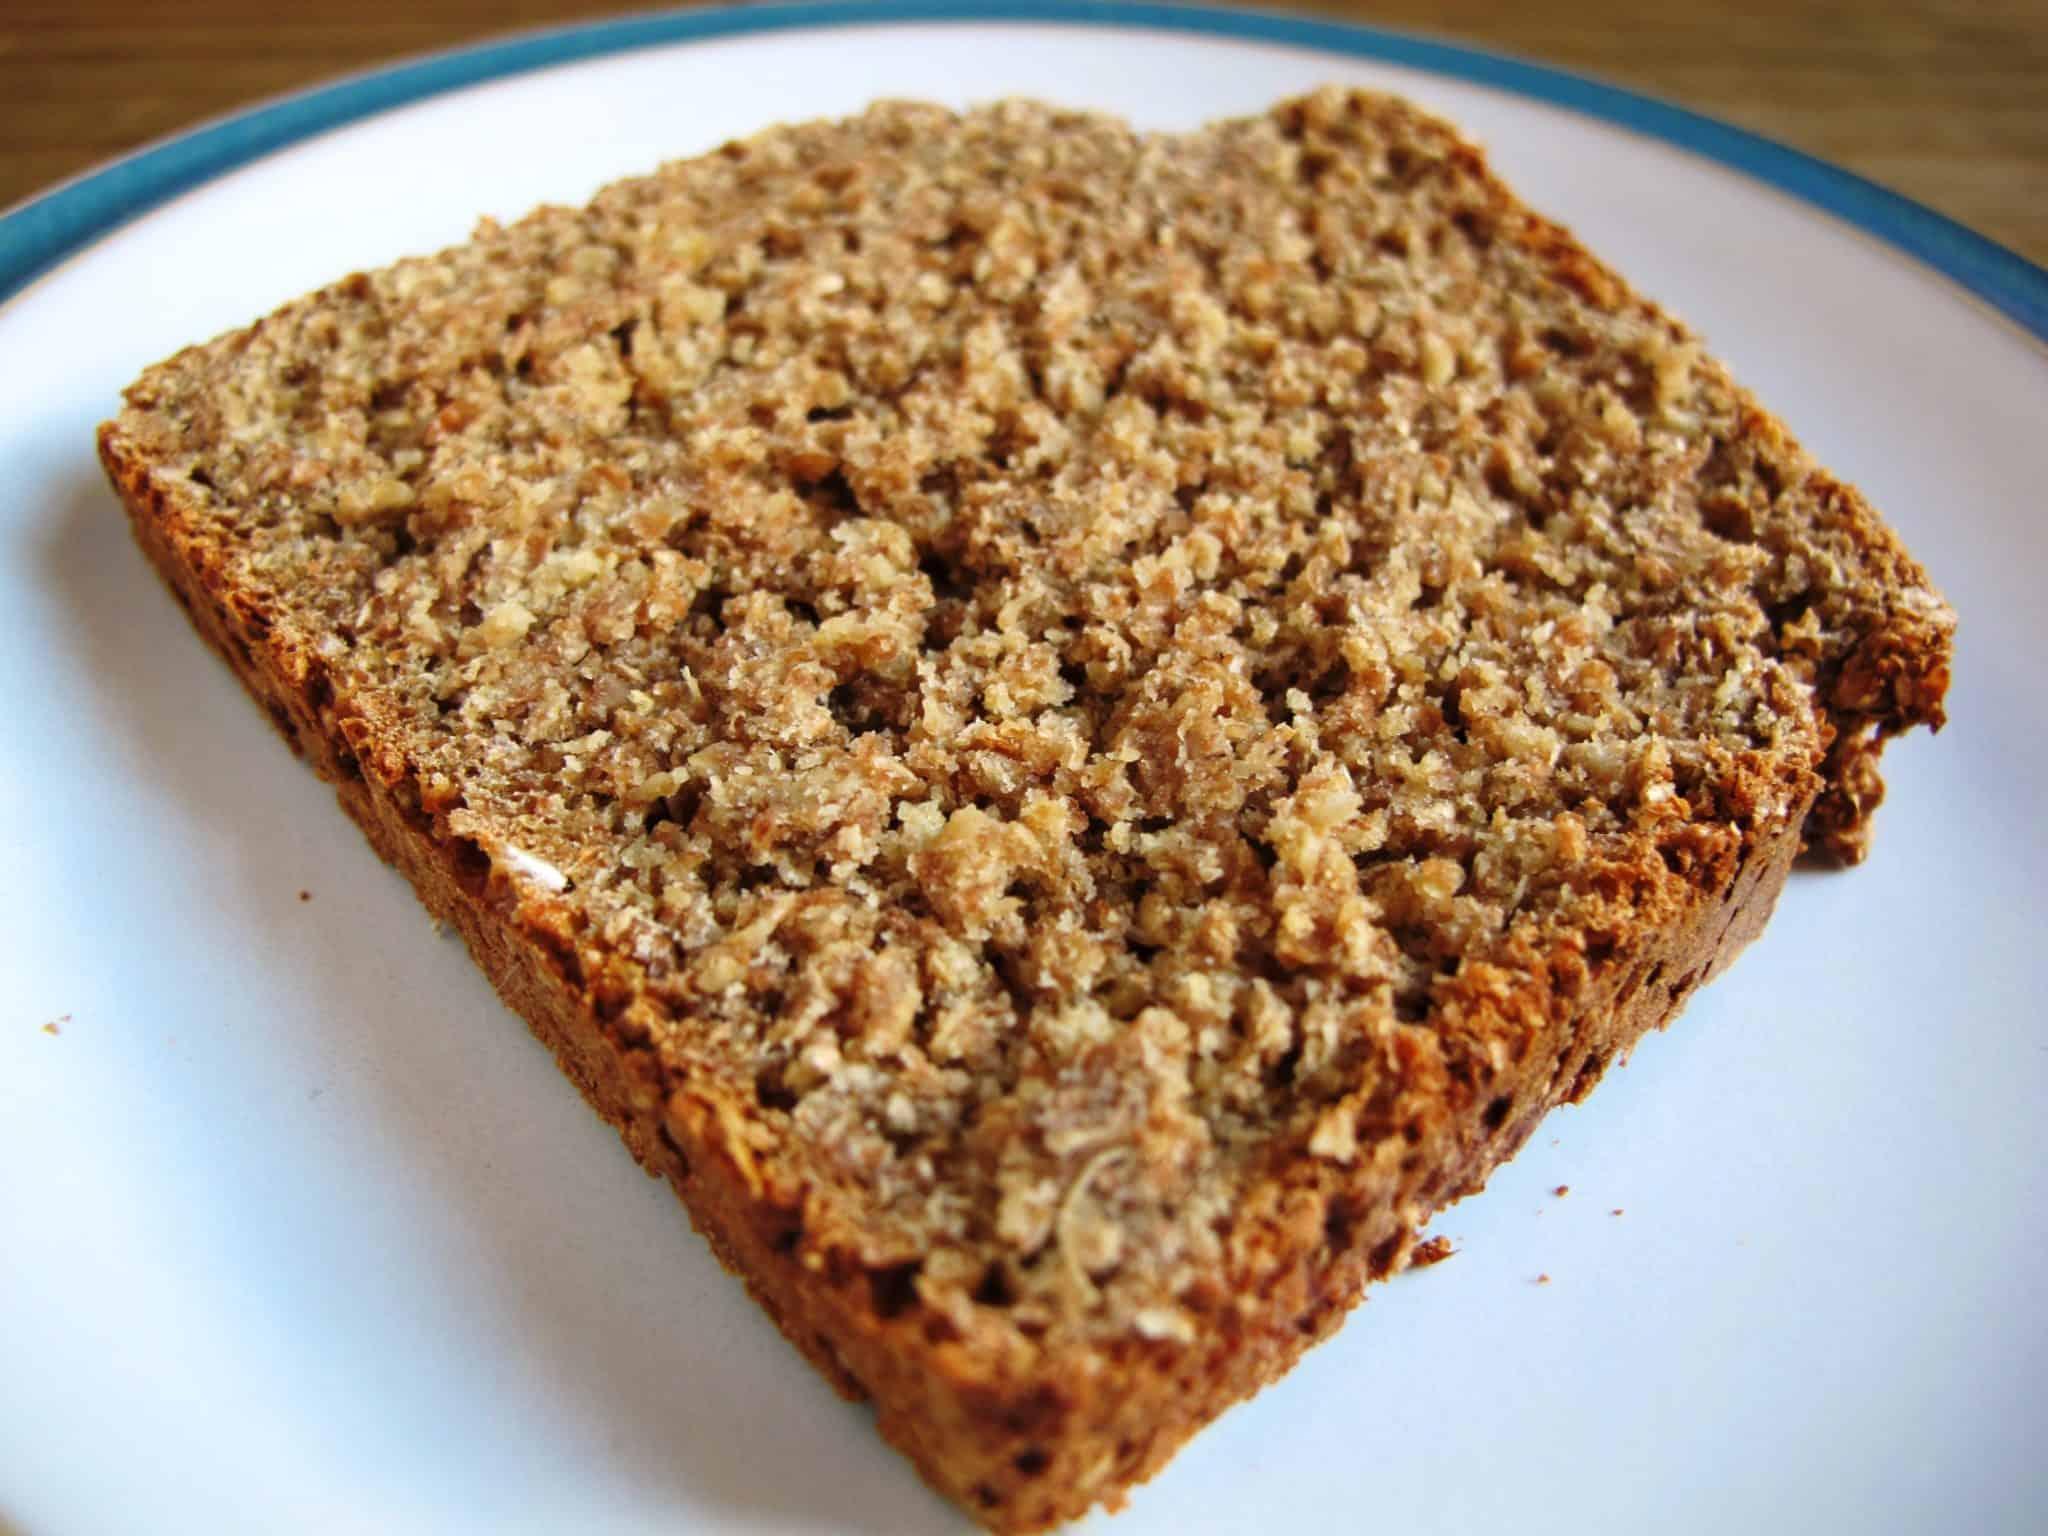 Best Irish Brown Soda Bread Recipe - TheBreadSheBakes.com